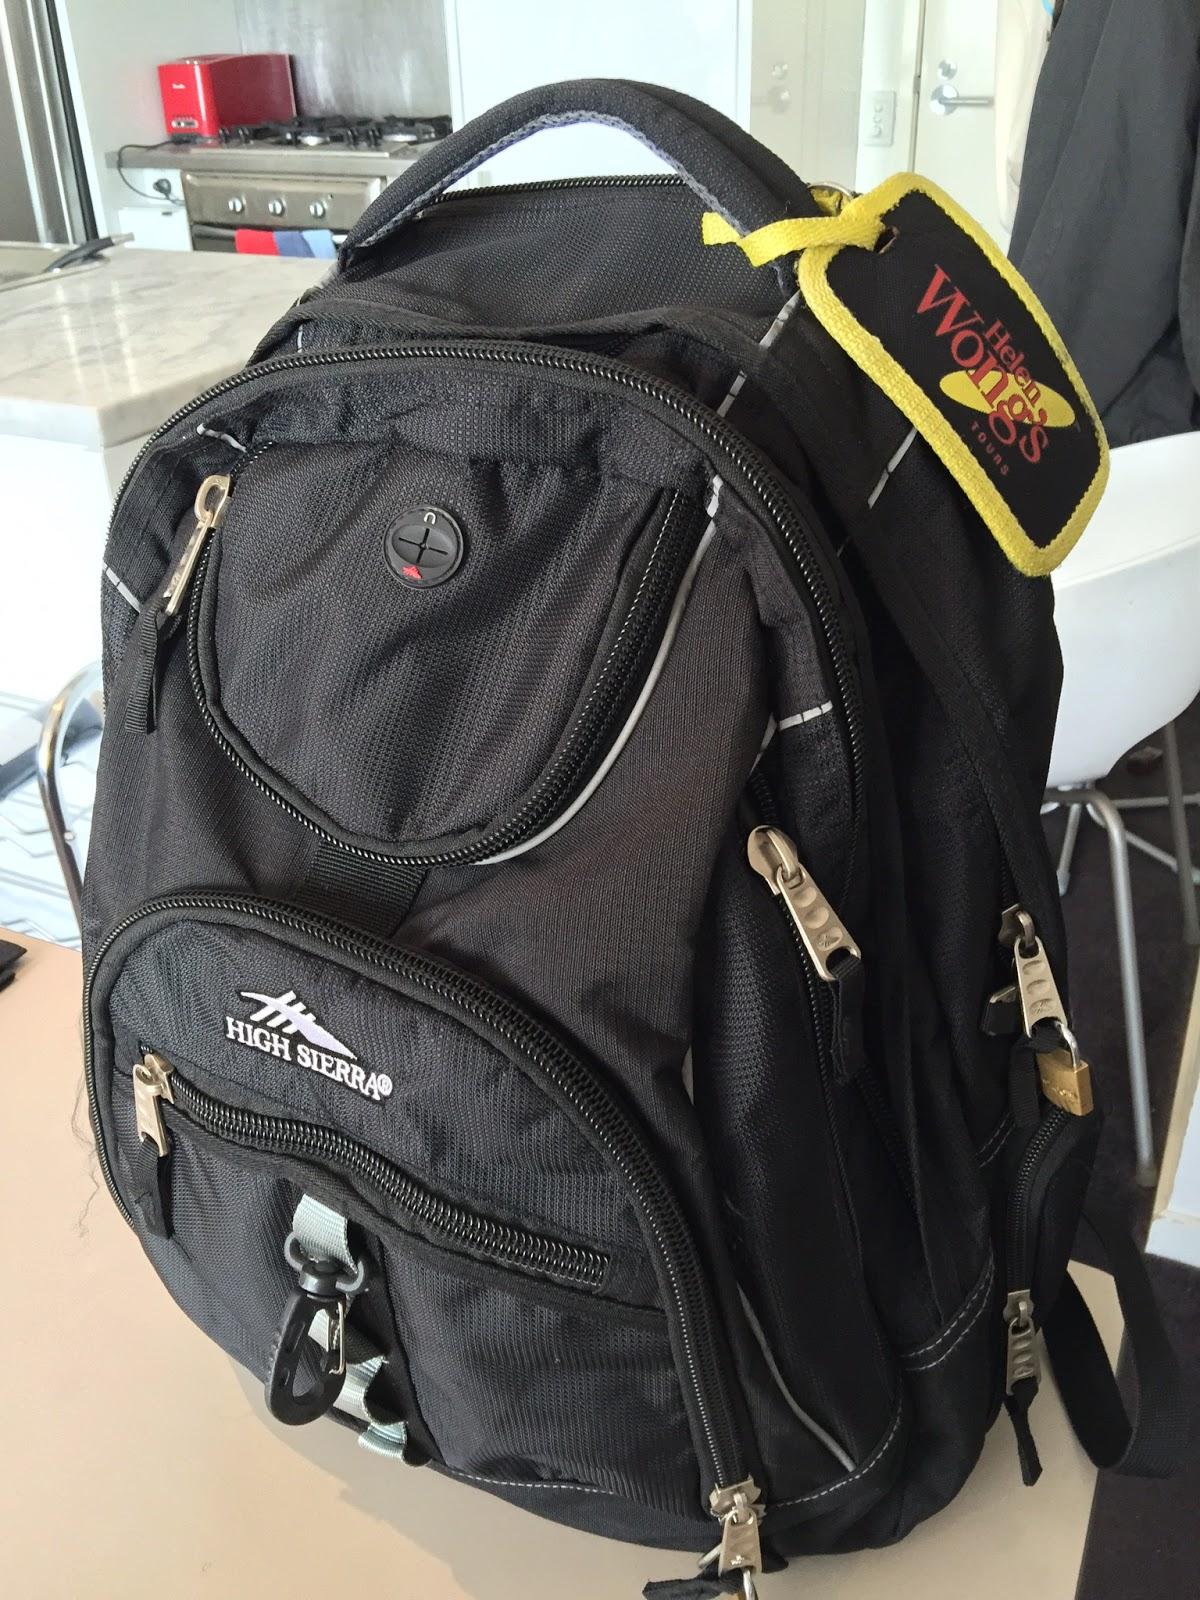 d3df5a2d51 Aerohaveno  Travel Gadget Review 2  High Sierra Access Backpack